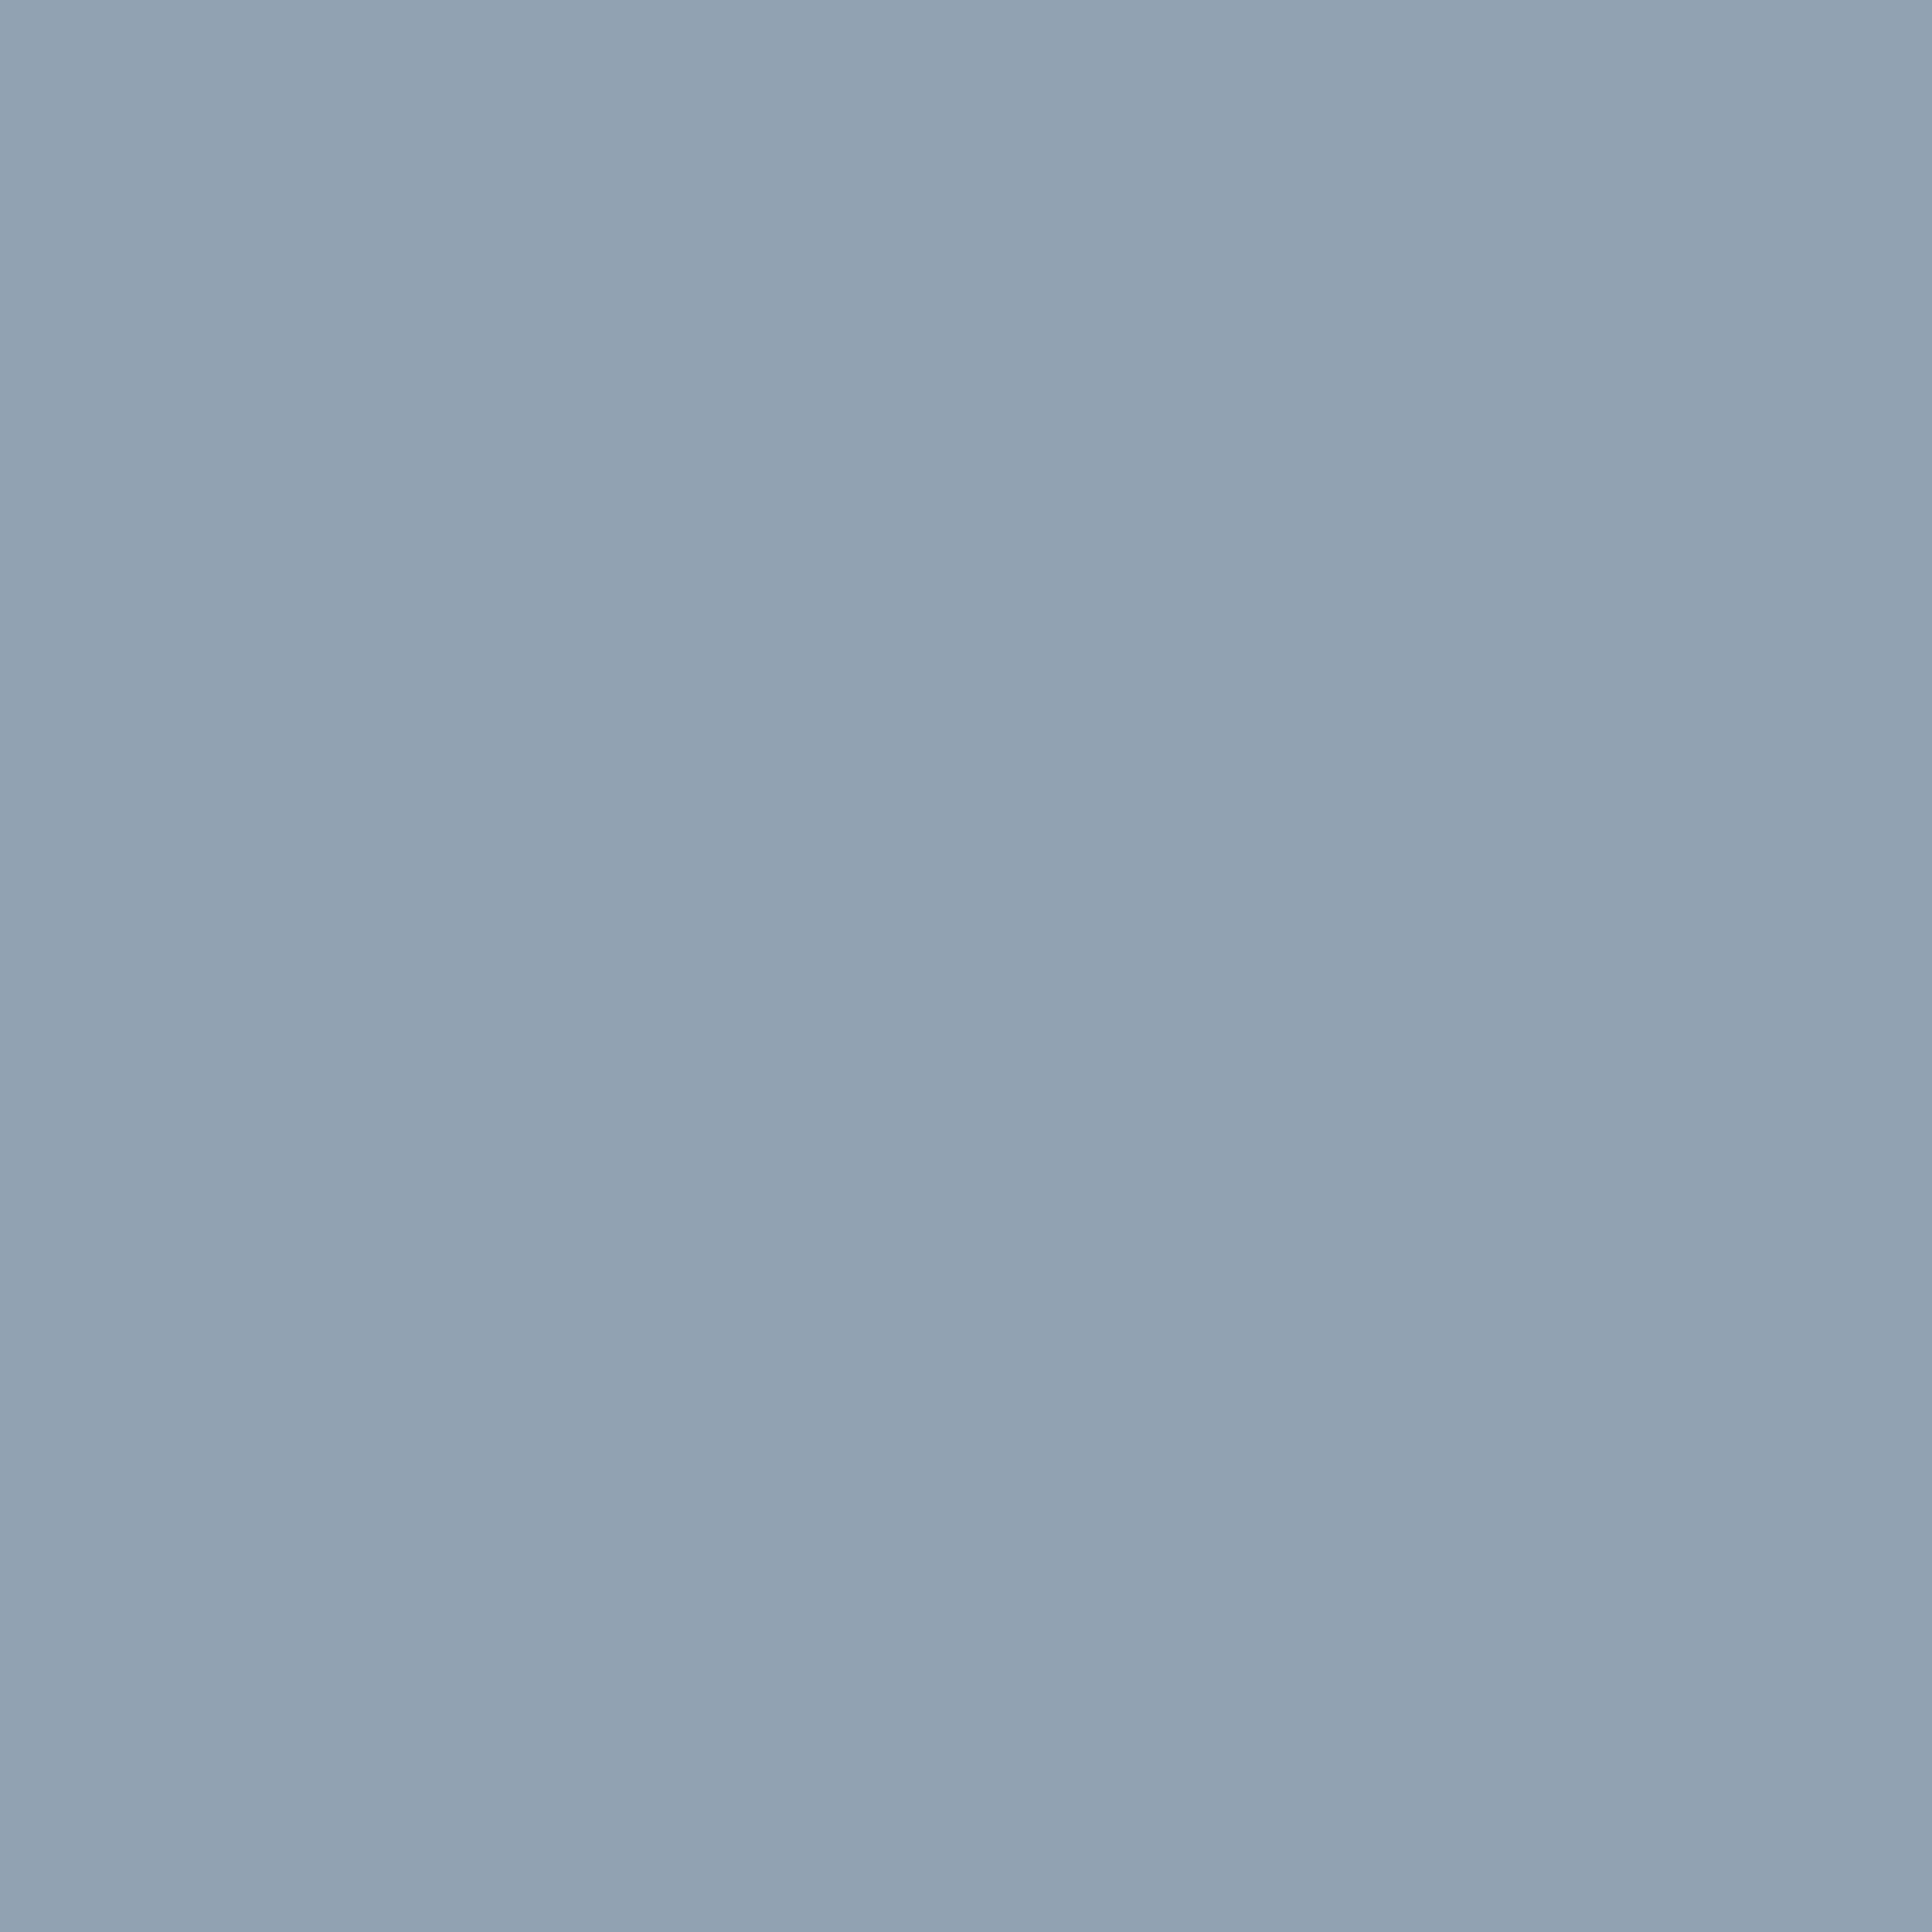 3600x3600 Cadet Grey Solid Color Background